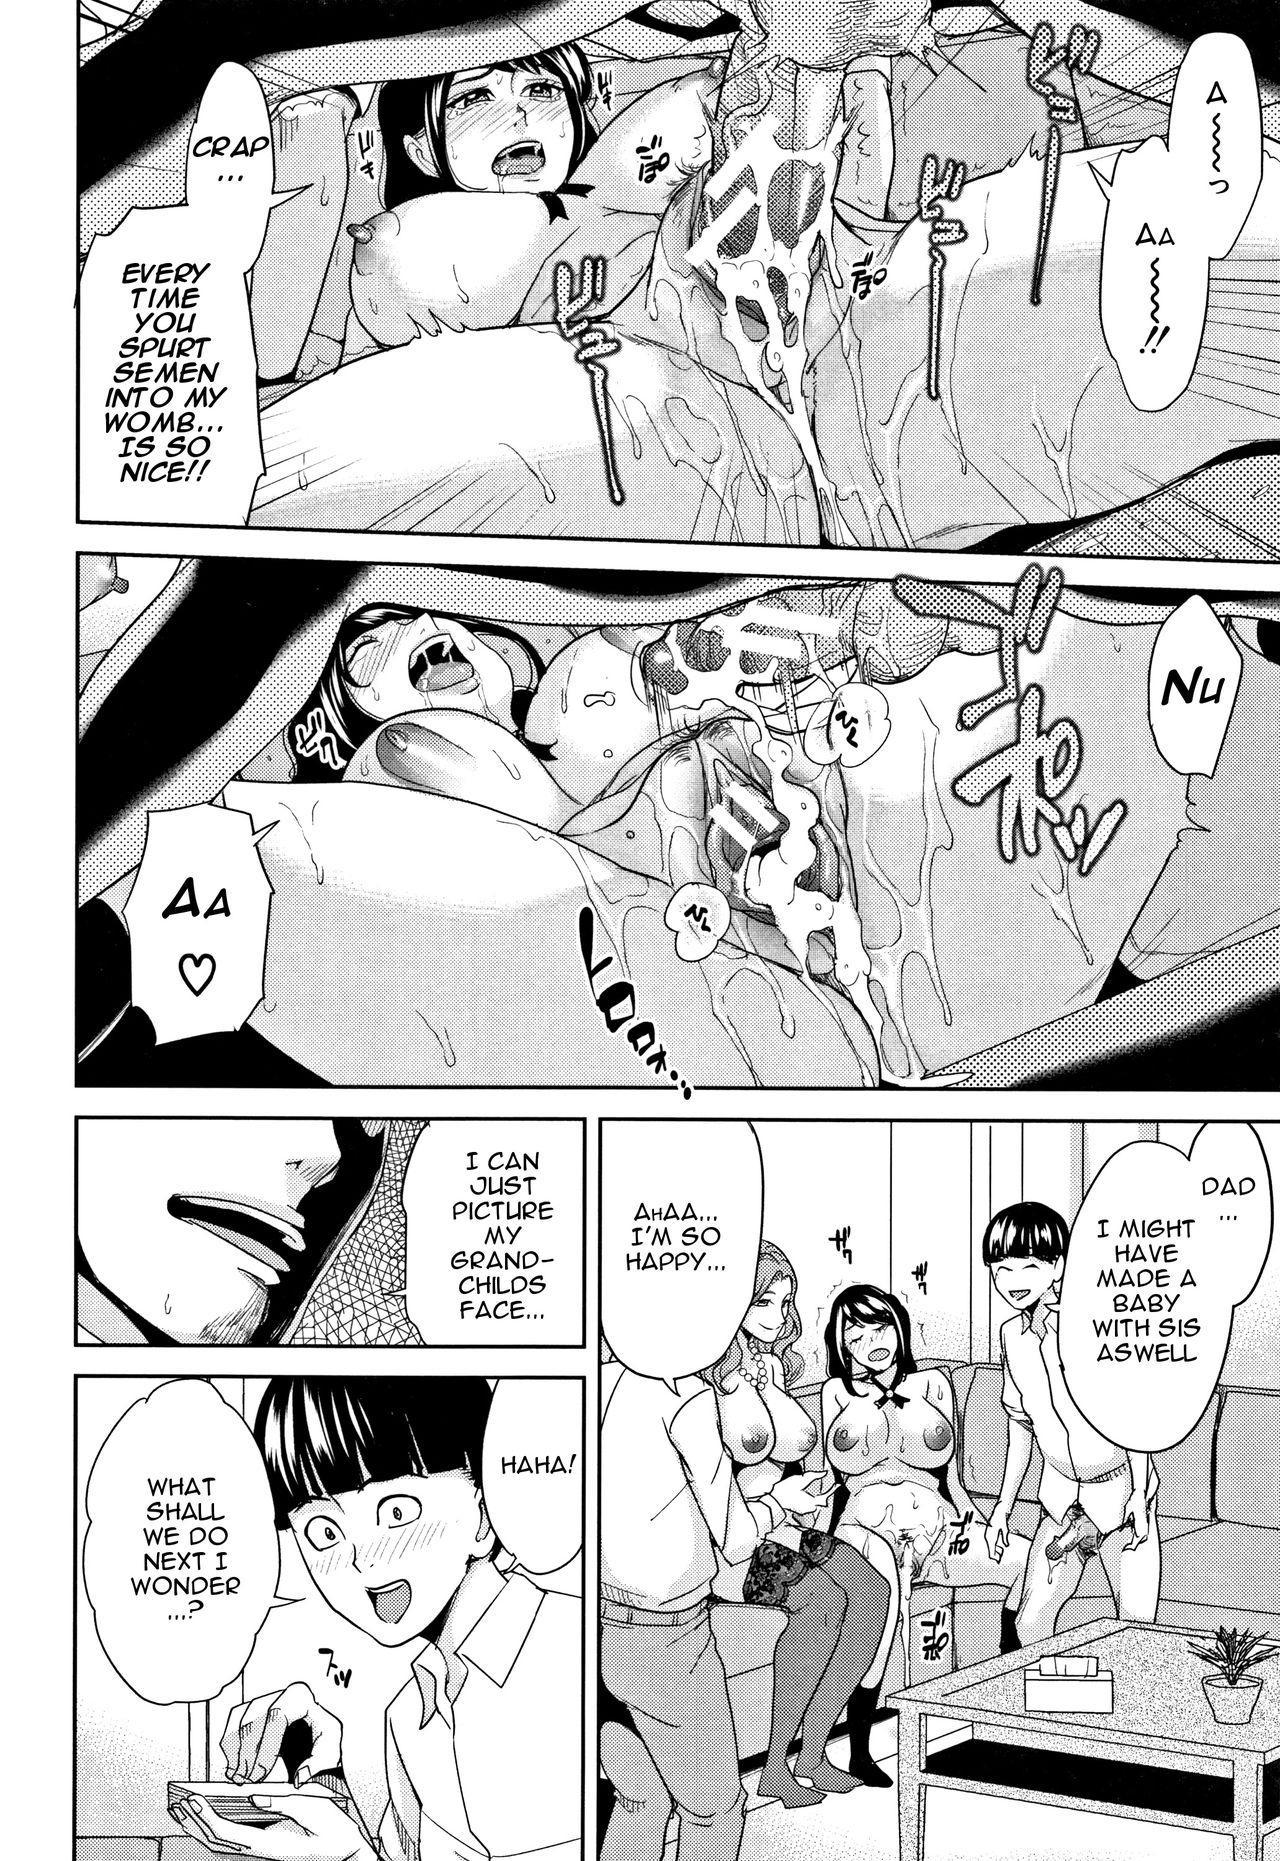 [Maimu-Maimu] Kazoku Soukan Game - family Incest game Ch. 1-3 [English] [Januz] 86